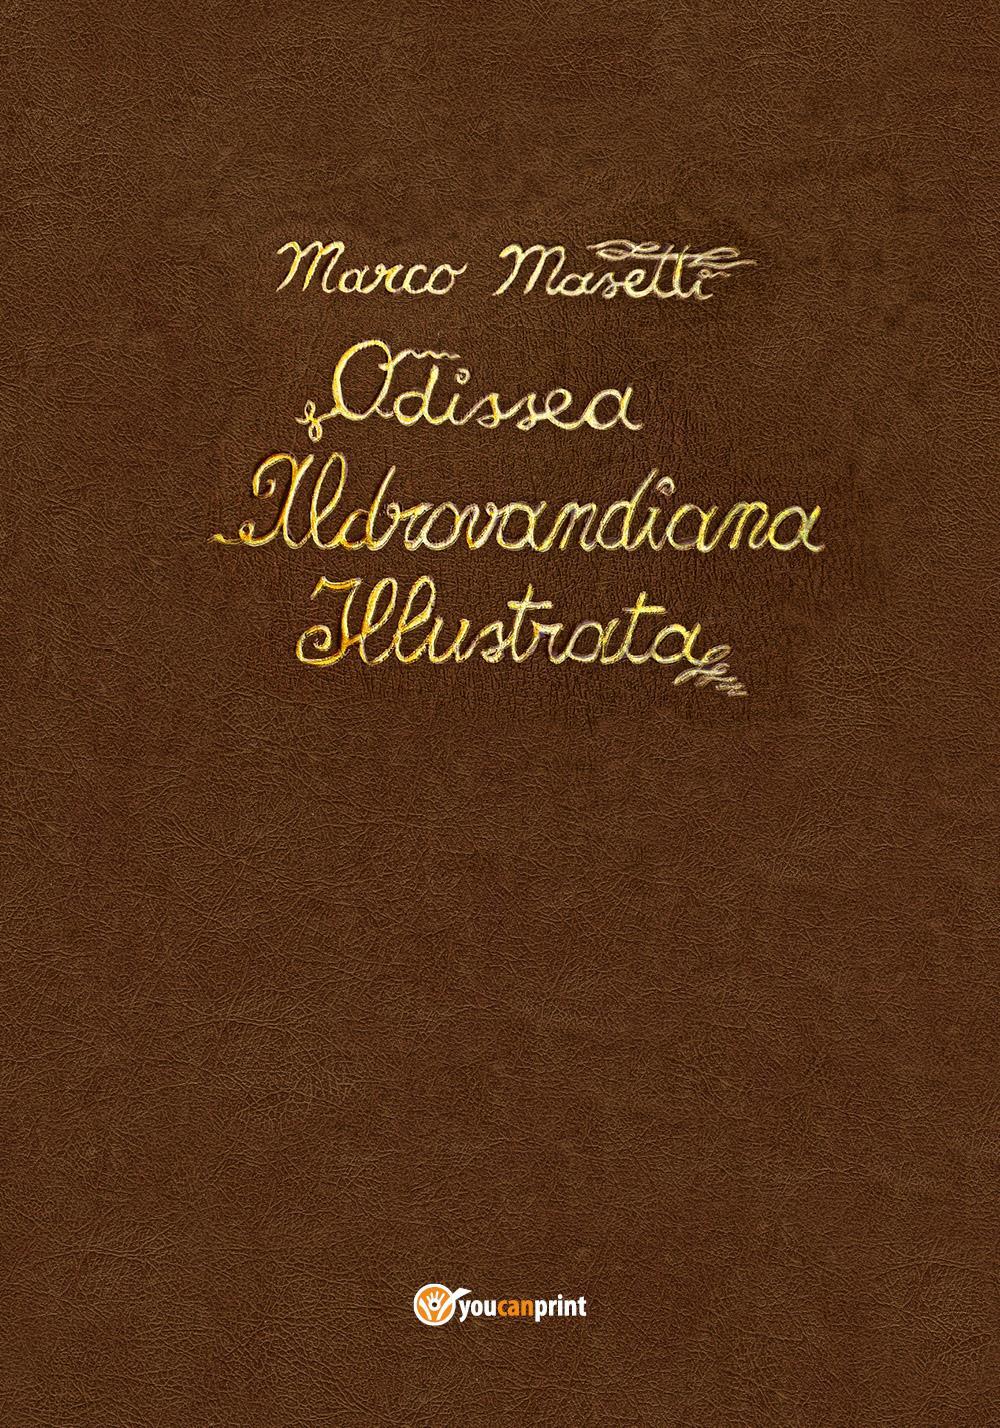 Odissea aldrovandiana illustrata-tesi accademica AS2